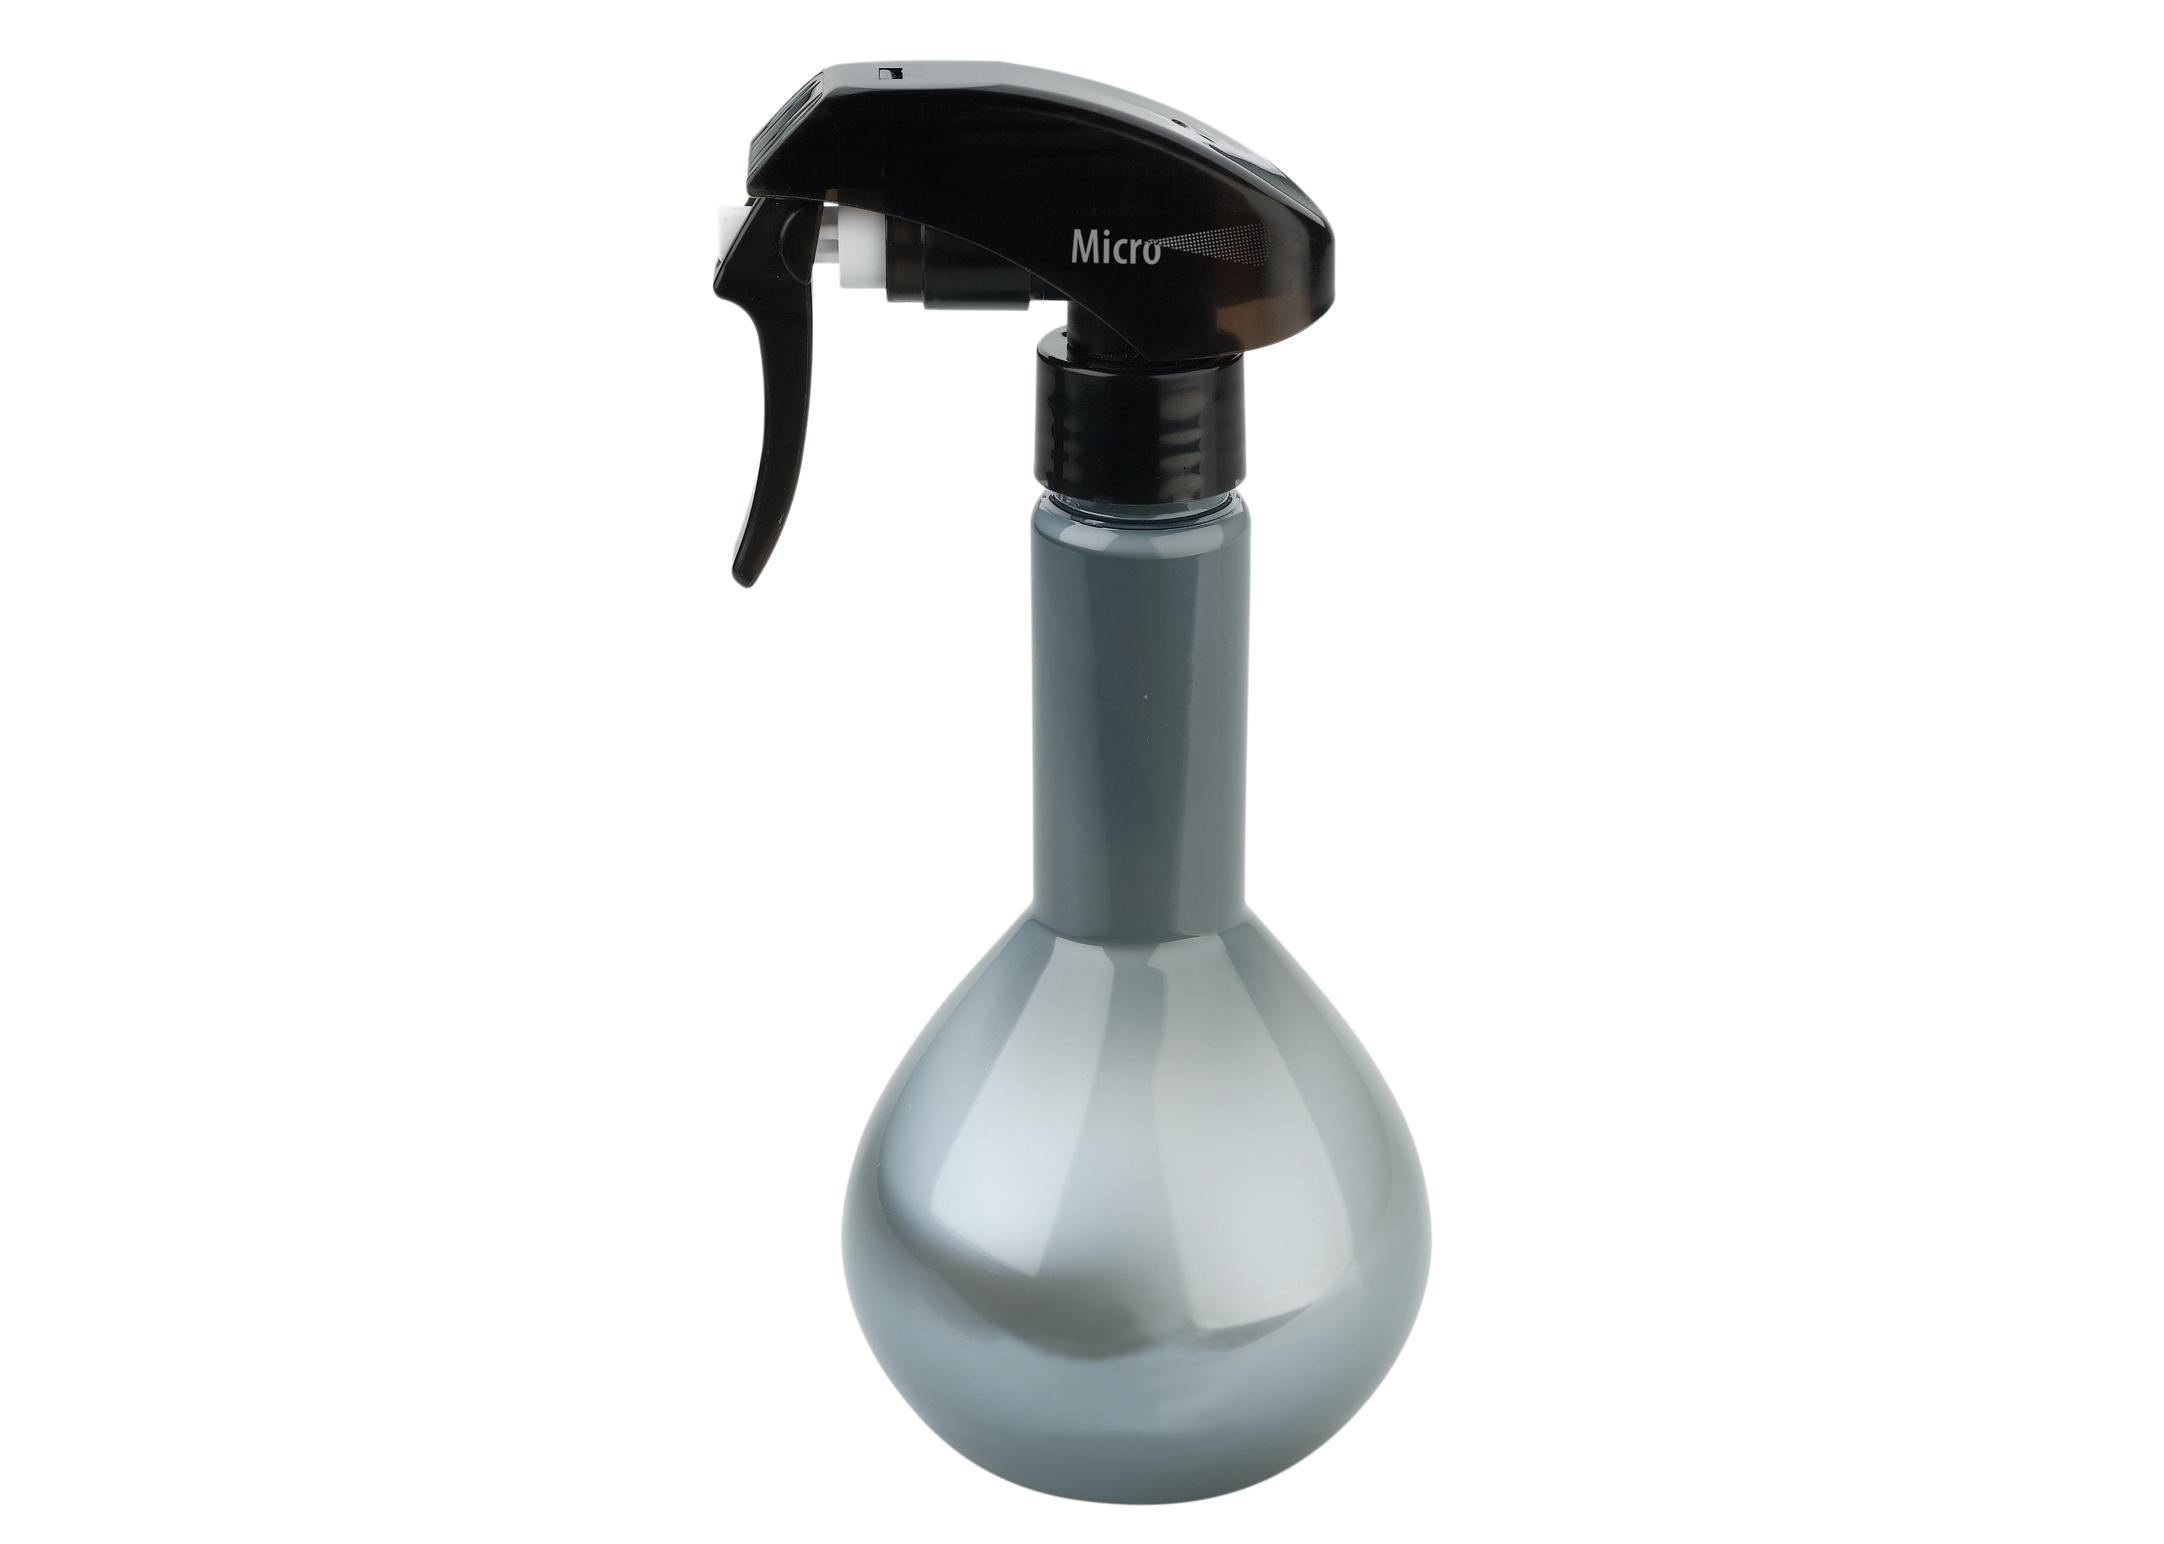 Vaporisateur Alembic Gris - 300 ml Vaporisateur